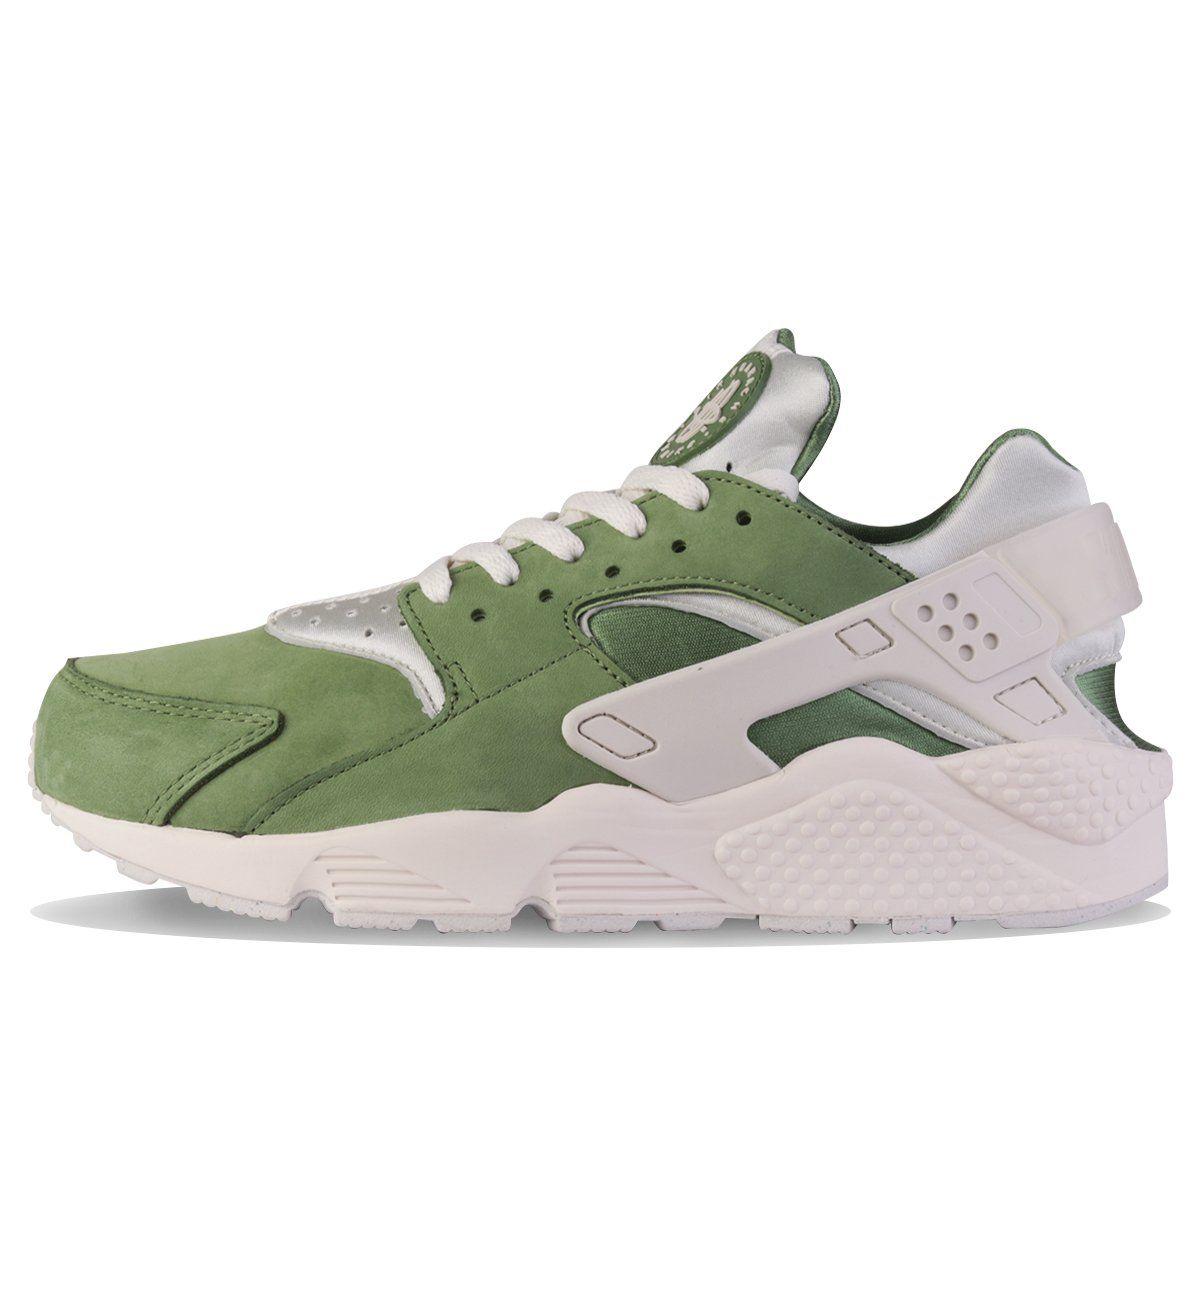 hot sale online f80f3 e43ca Nike Air Huarache Run PRM Treeline   Light Bone   Bamboo - Nike